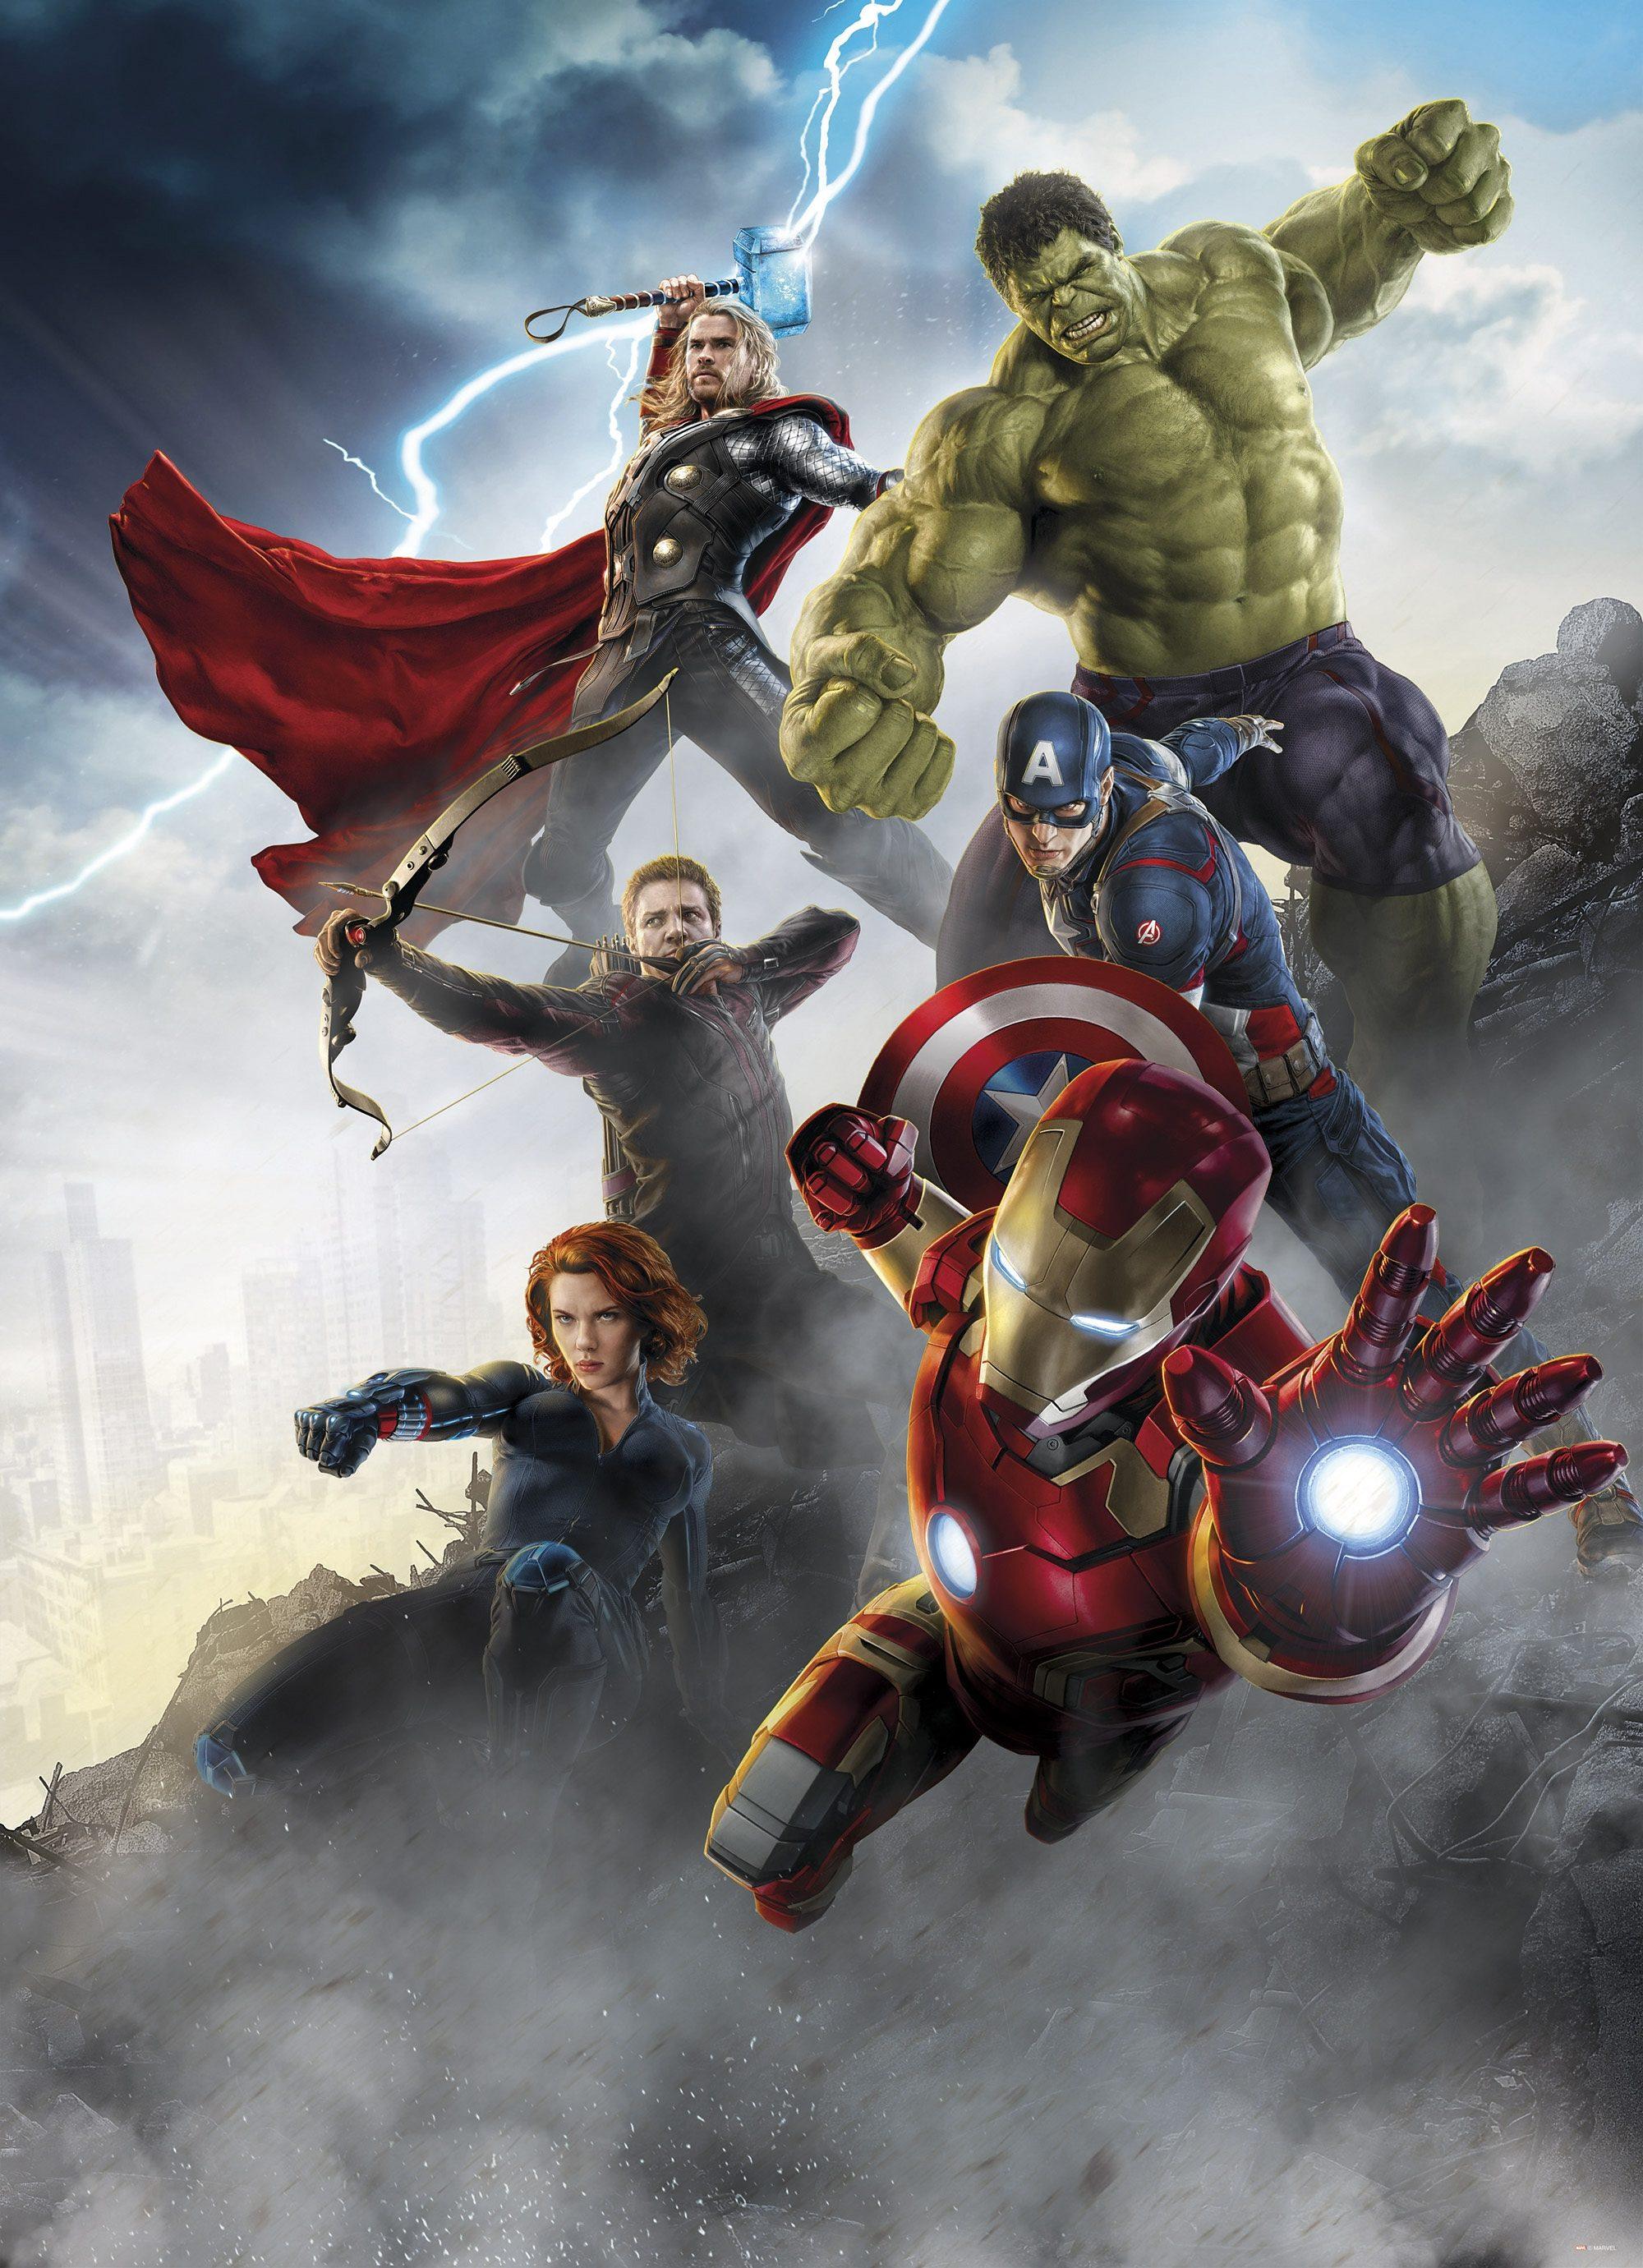 Komar, Papiertapete, »Avengers Age of Ultron«, 184/254 cm